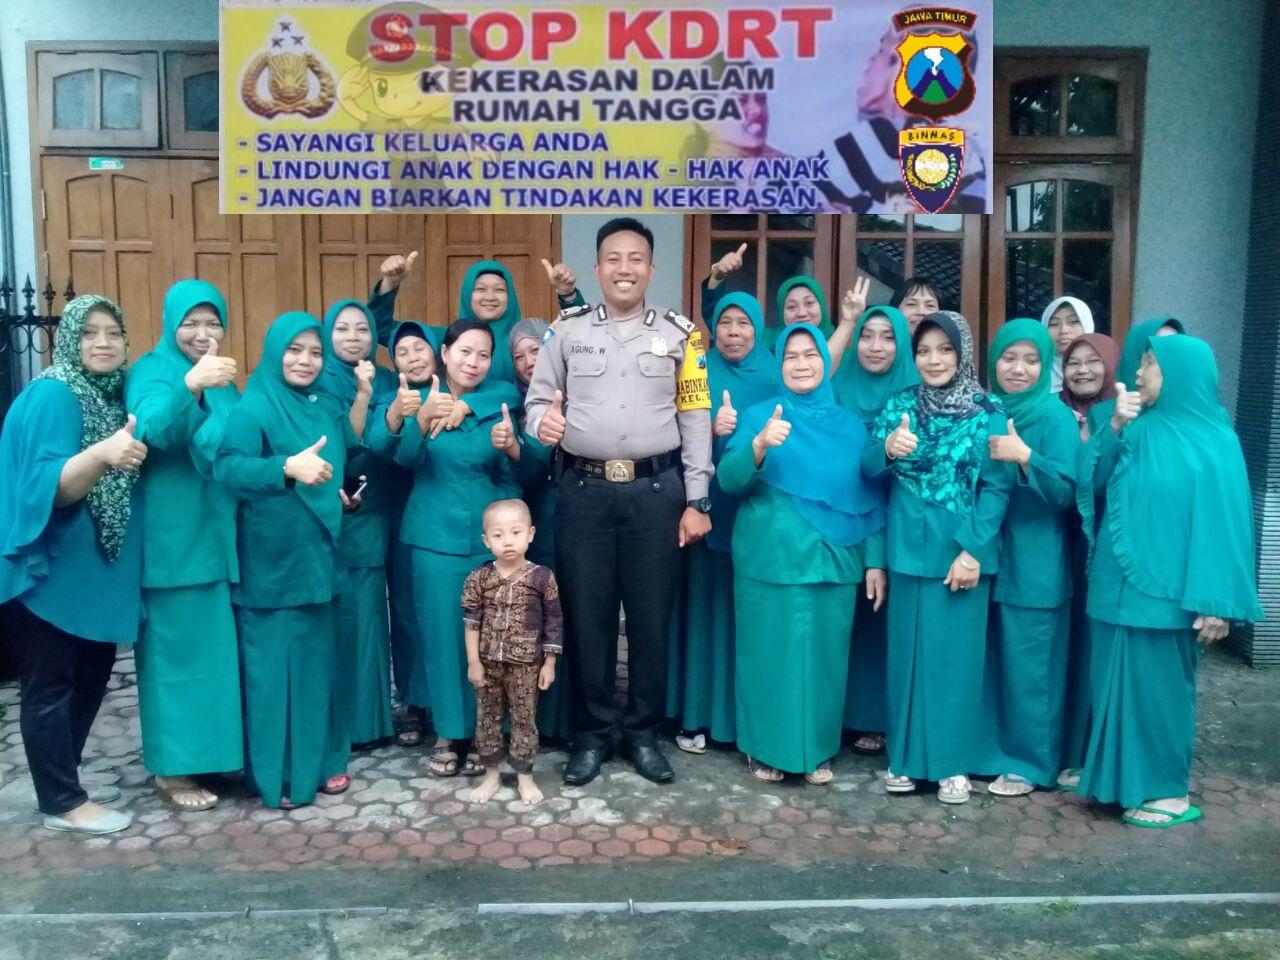 Anggota Bhabinkamtibmas Polsek Batu Kota Polres Batu Binluh Kepada Ibu-Ibu Pkk